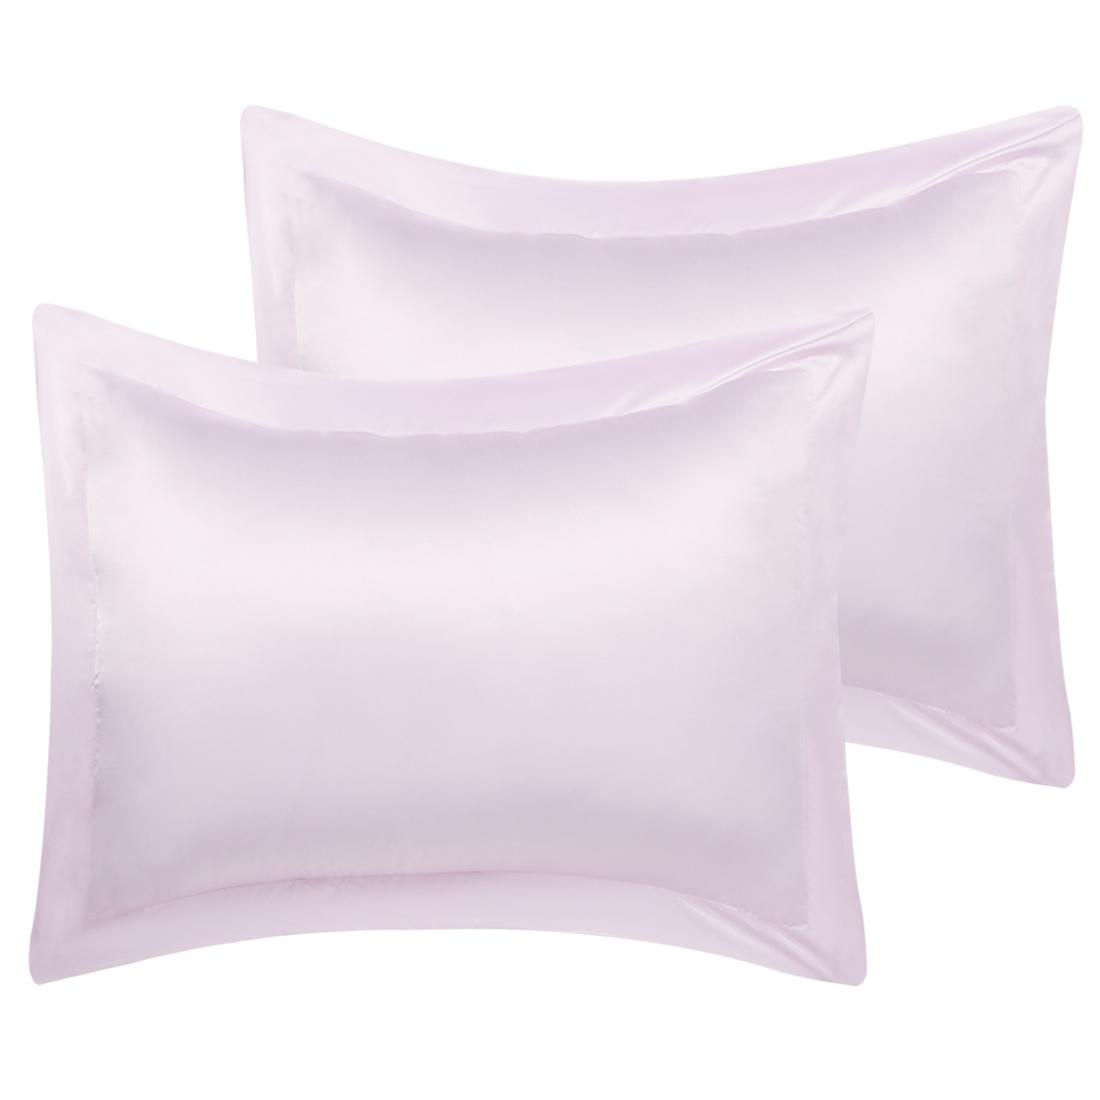 2 Pcs Lavender Gray Pillow Shams Satin Pillow Cases Boudoir Oxford Pillowcases